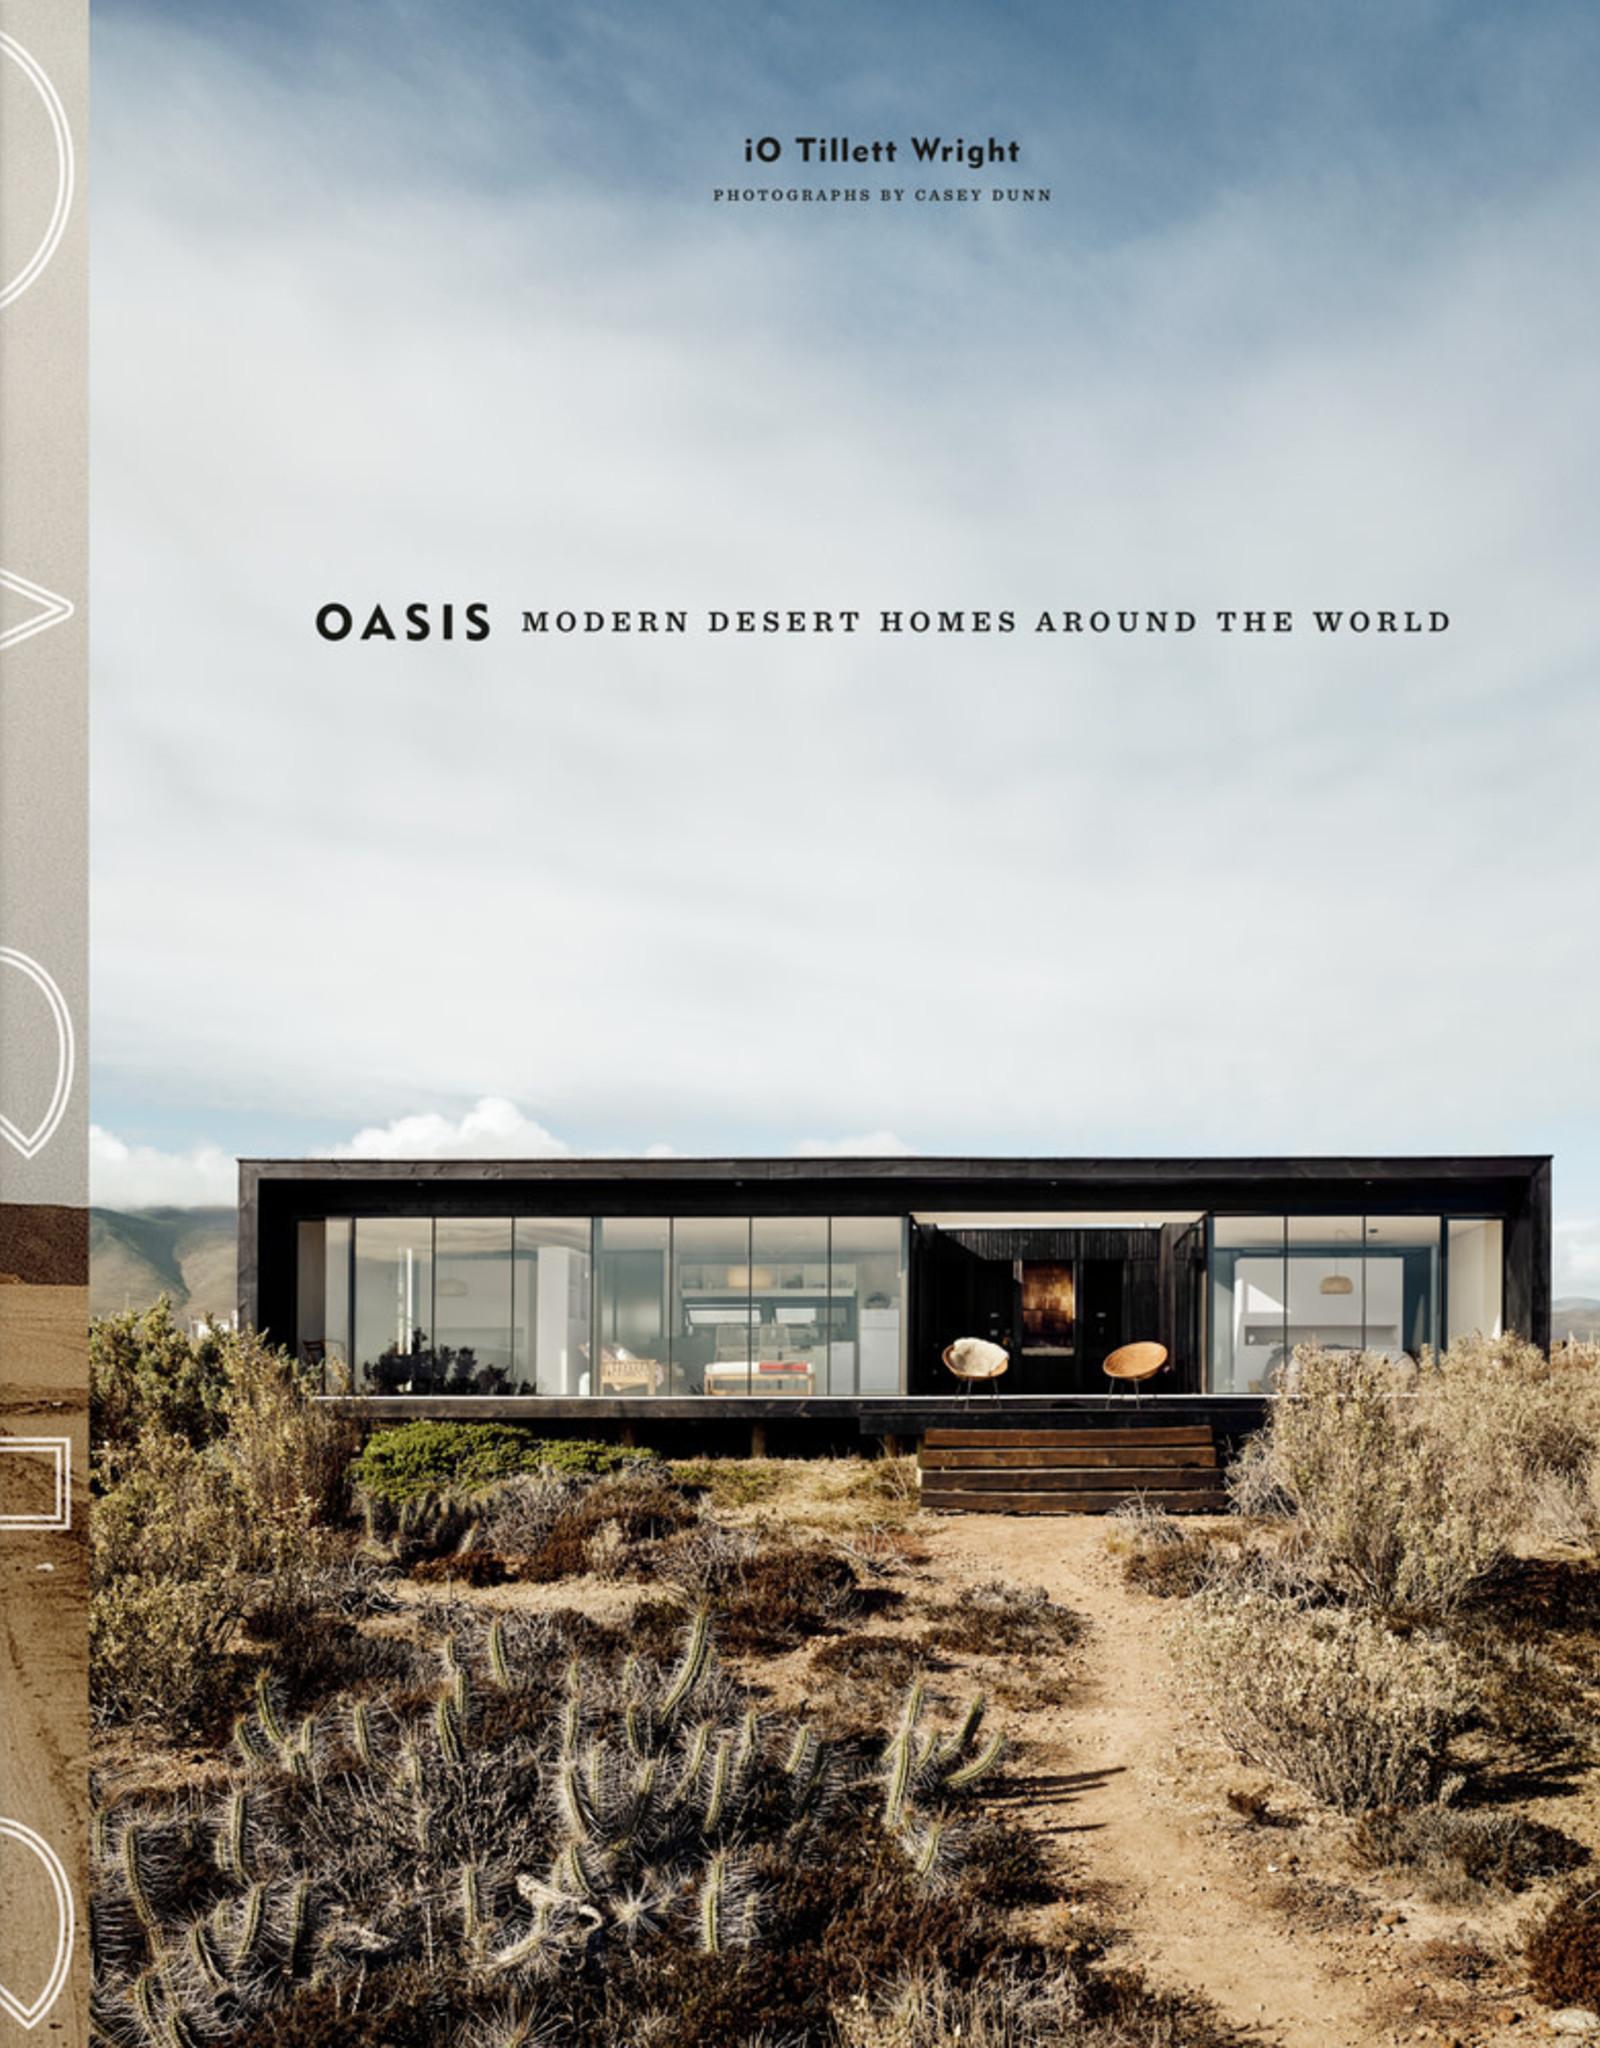 Oasis -Modern Desert Homes Around the World